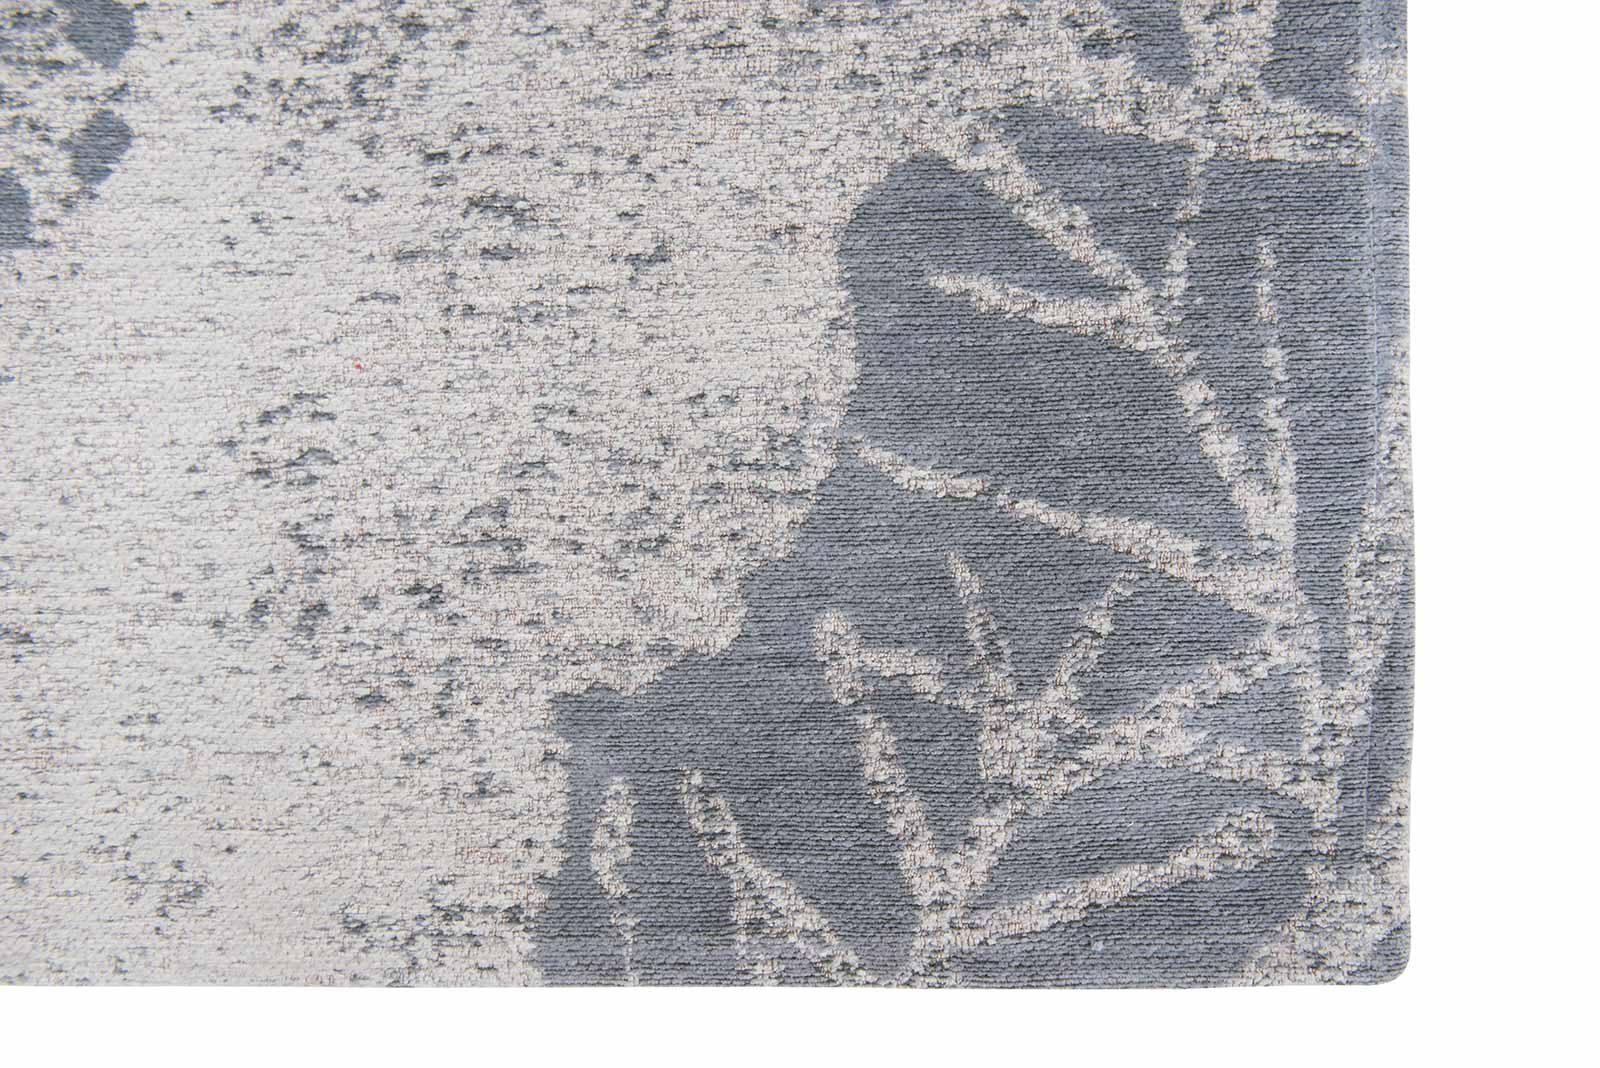 Louis De Poortere vloerkleed Romo LX 8742 Lomasi Steelblue corner